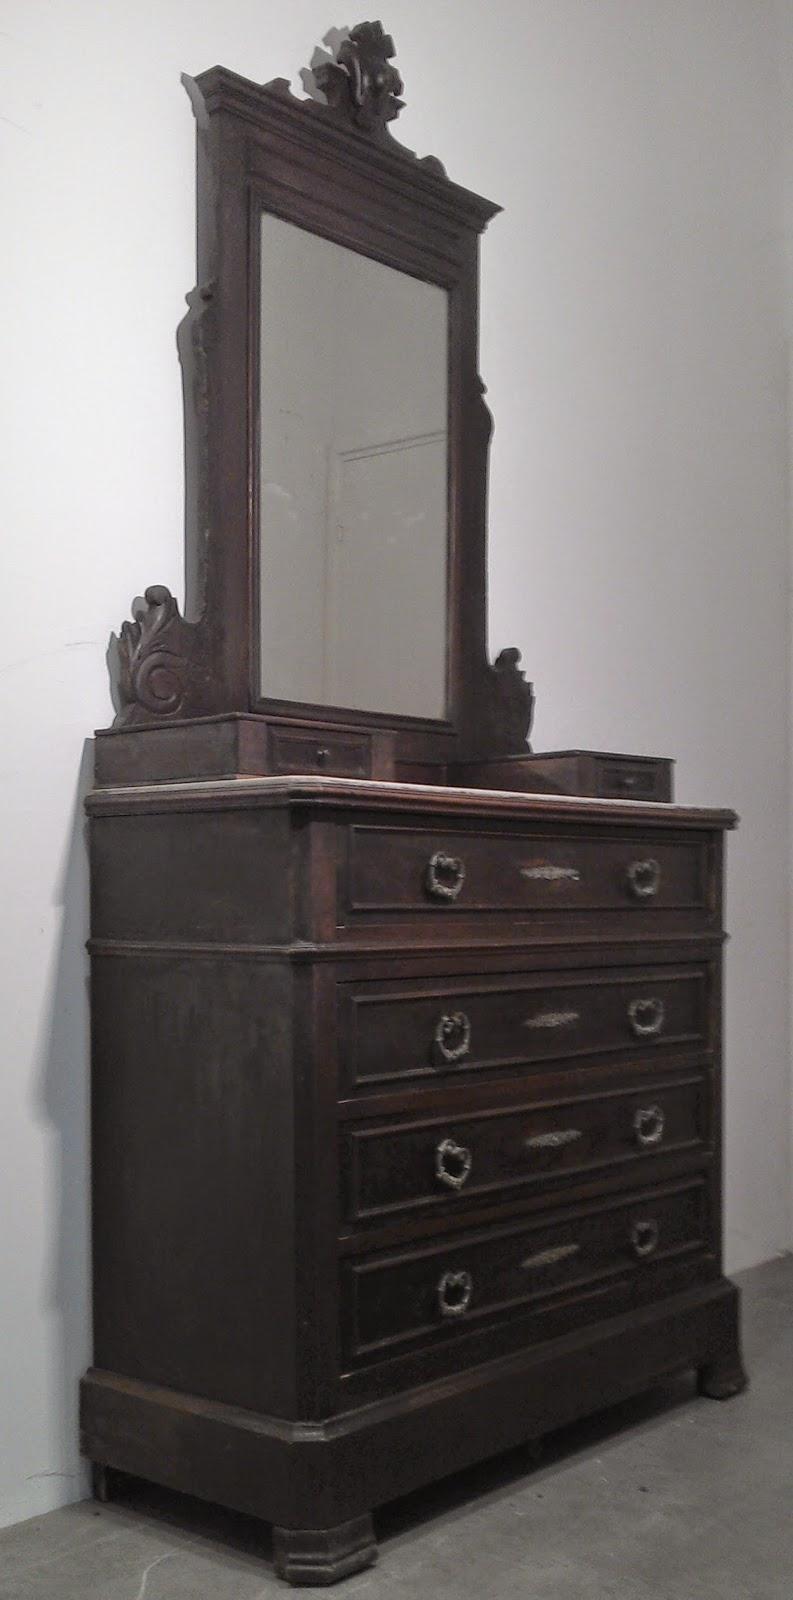 Ancien meuble coiffeuse commode a tiroirs surmont d - Coiffeuse meuble ancien ...